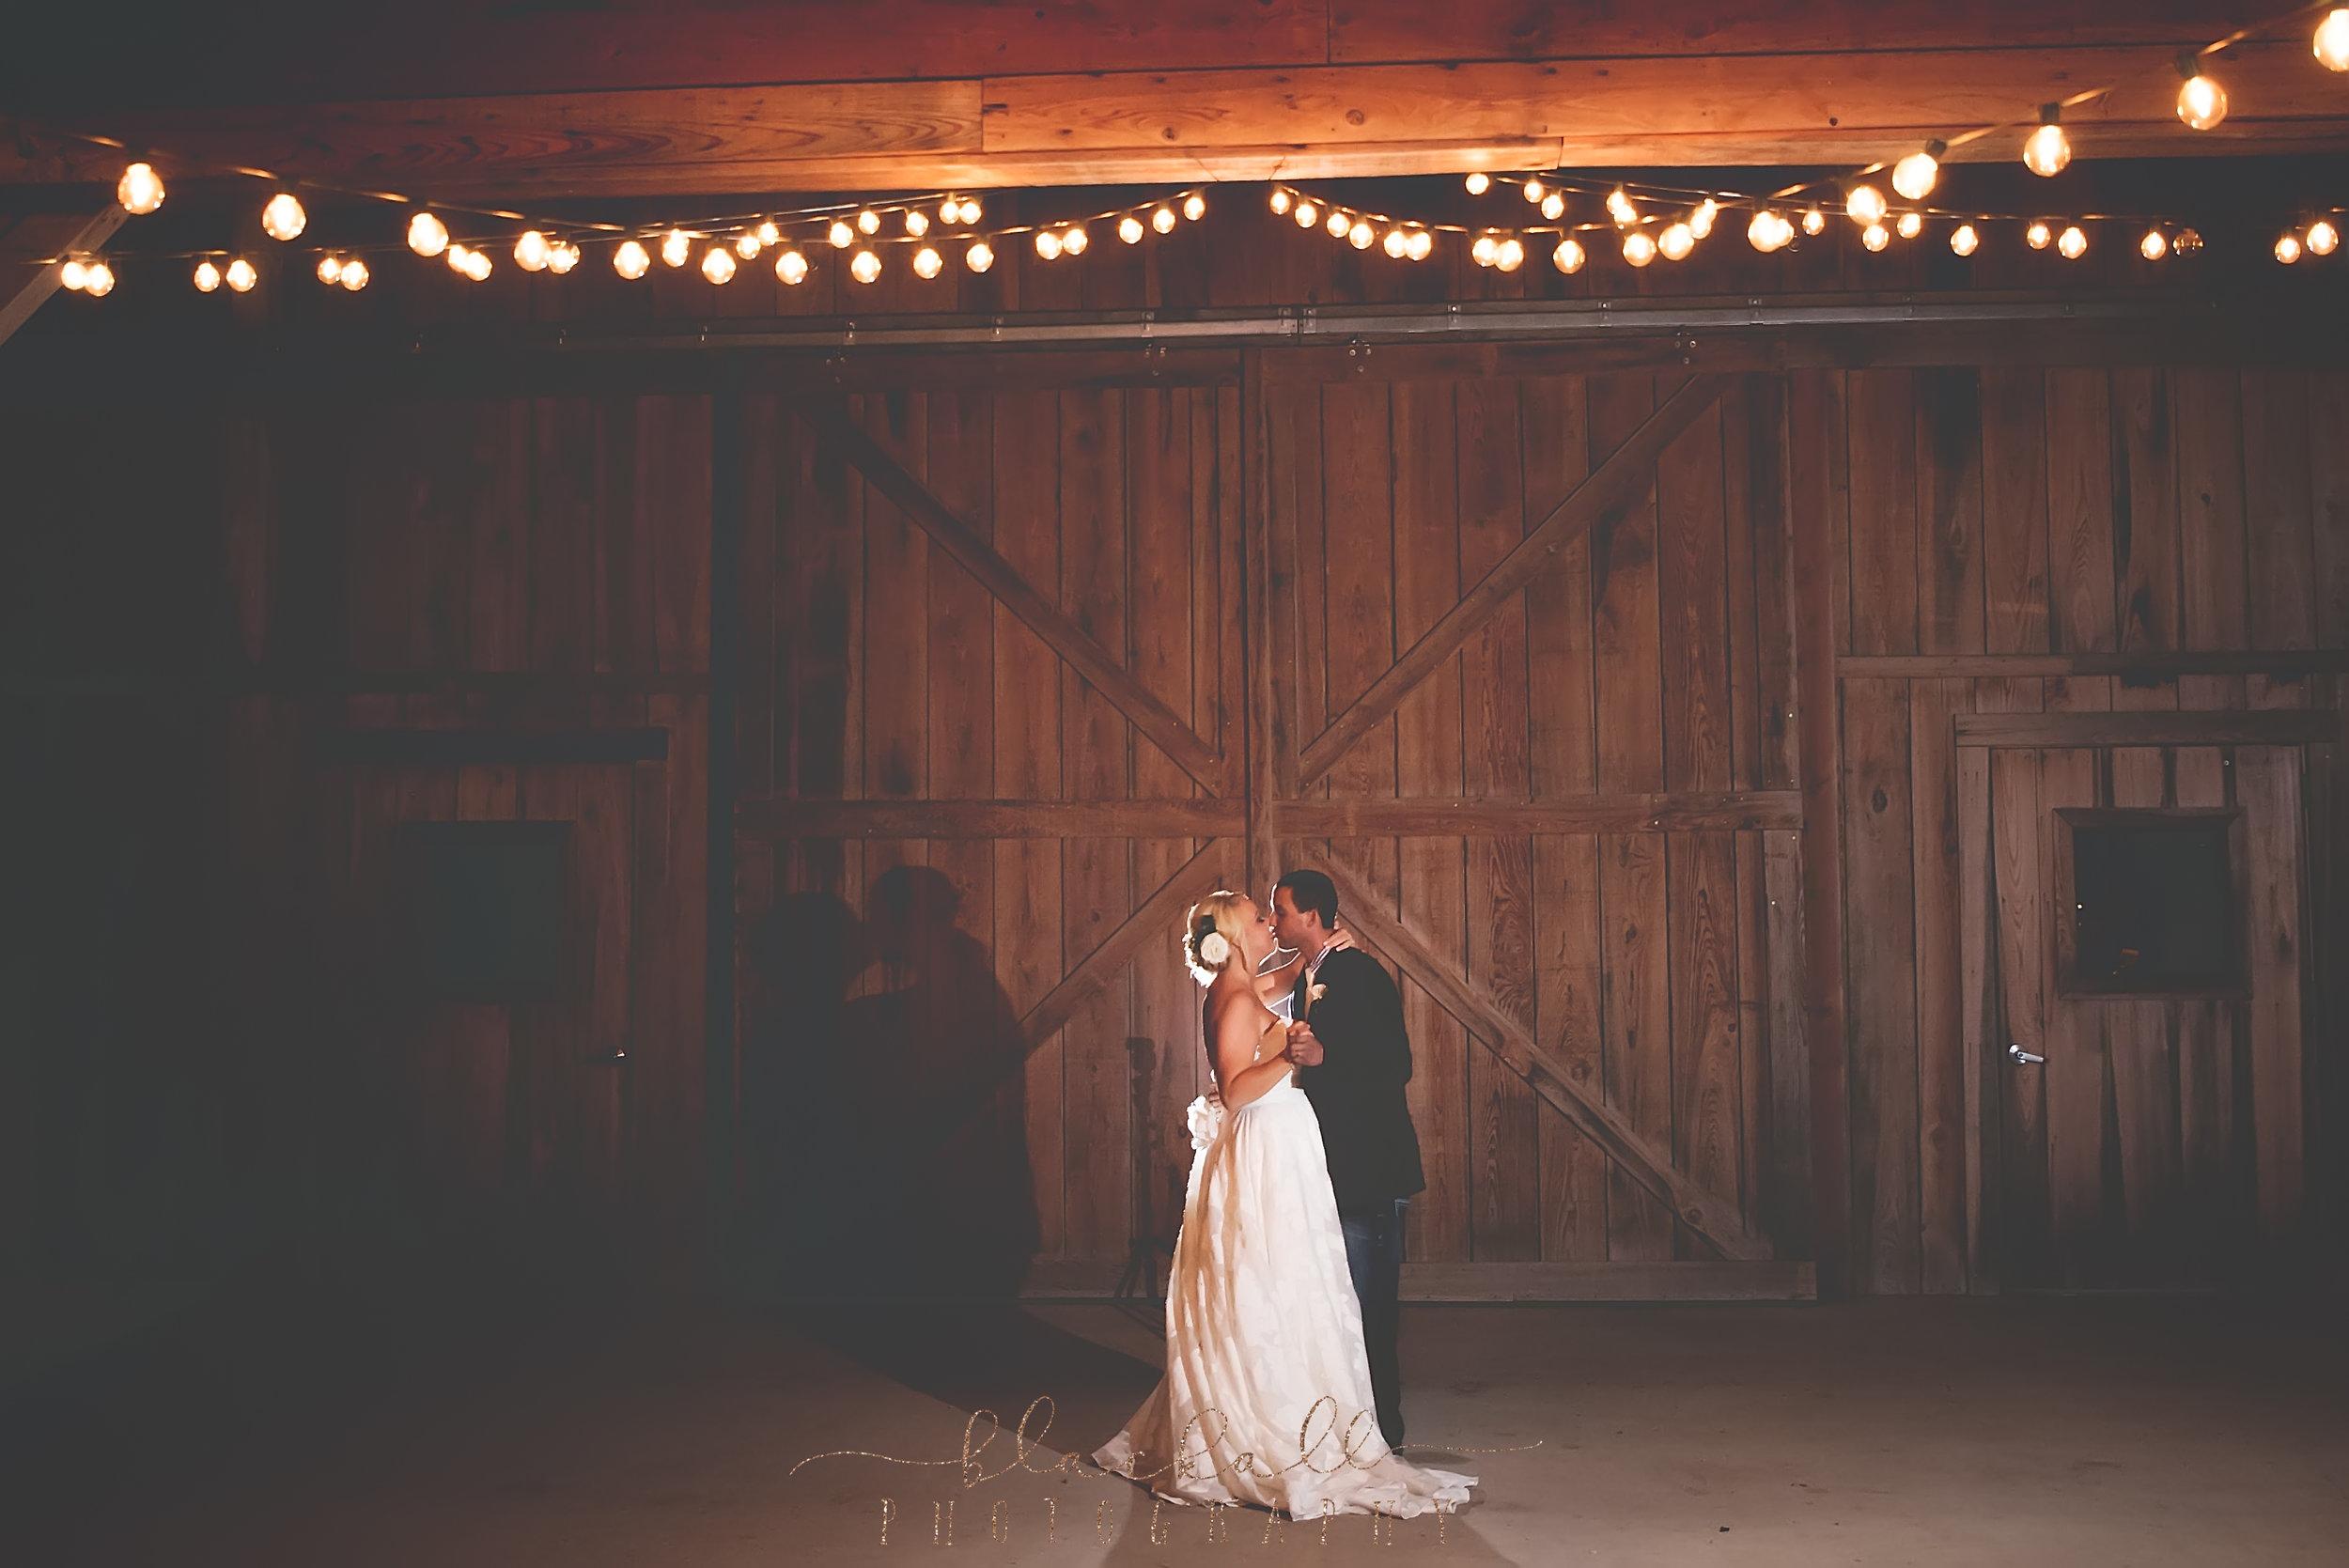 M&M WEDDING_Blackall Photography-49.JPG